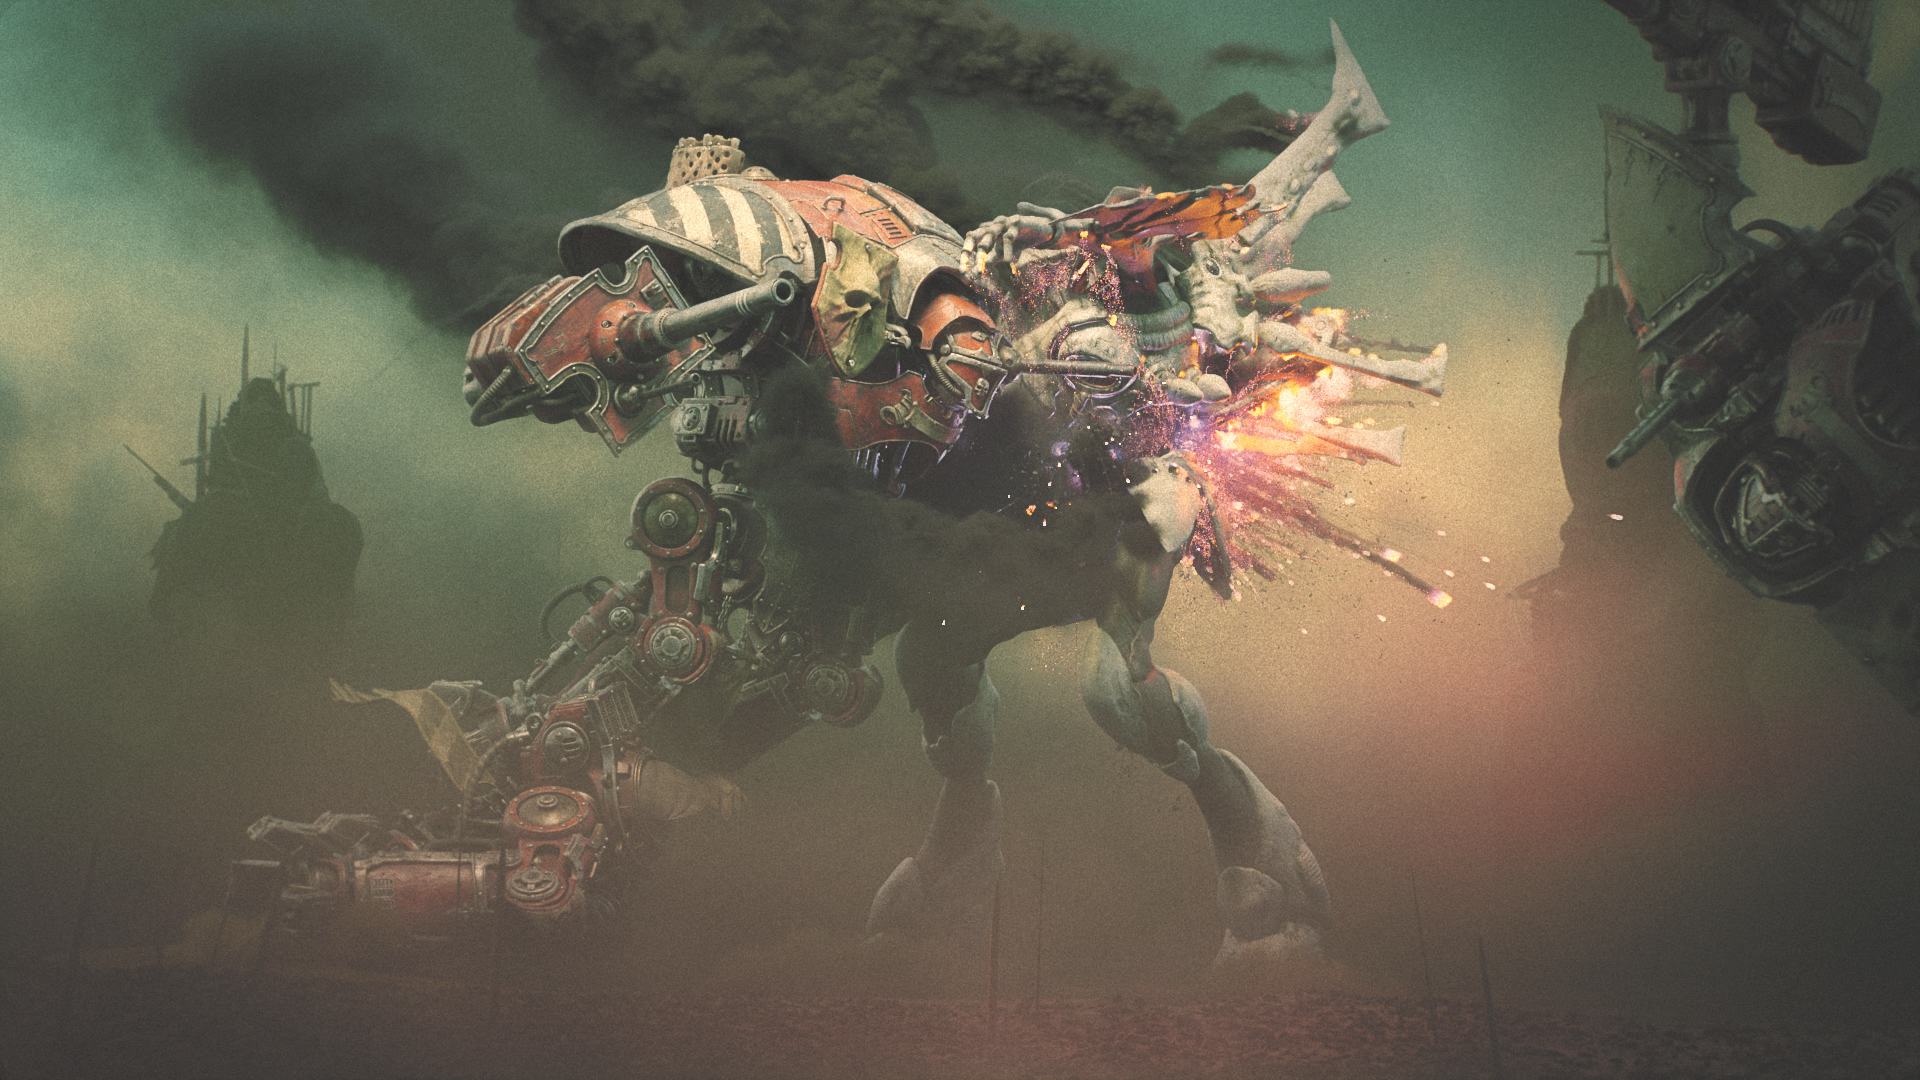 dawn_of_war_3-6.jpg